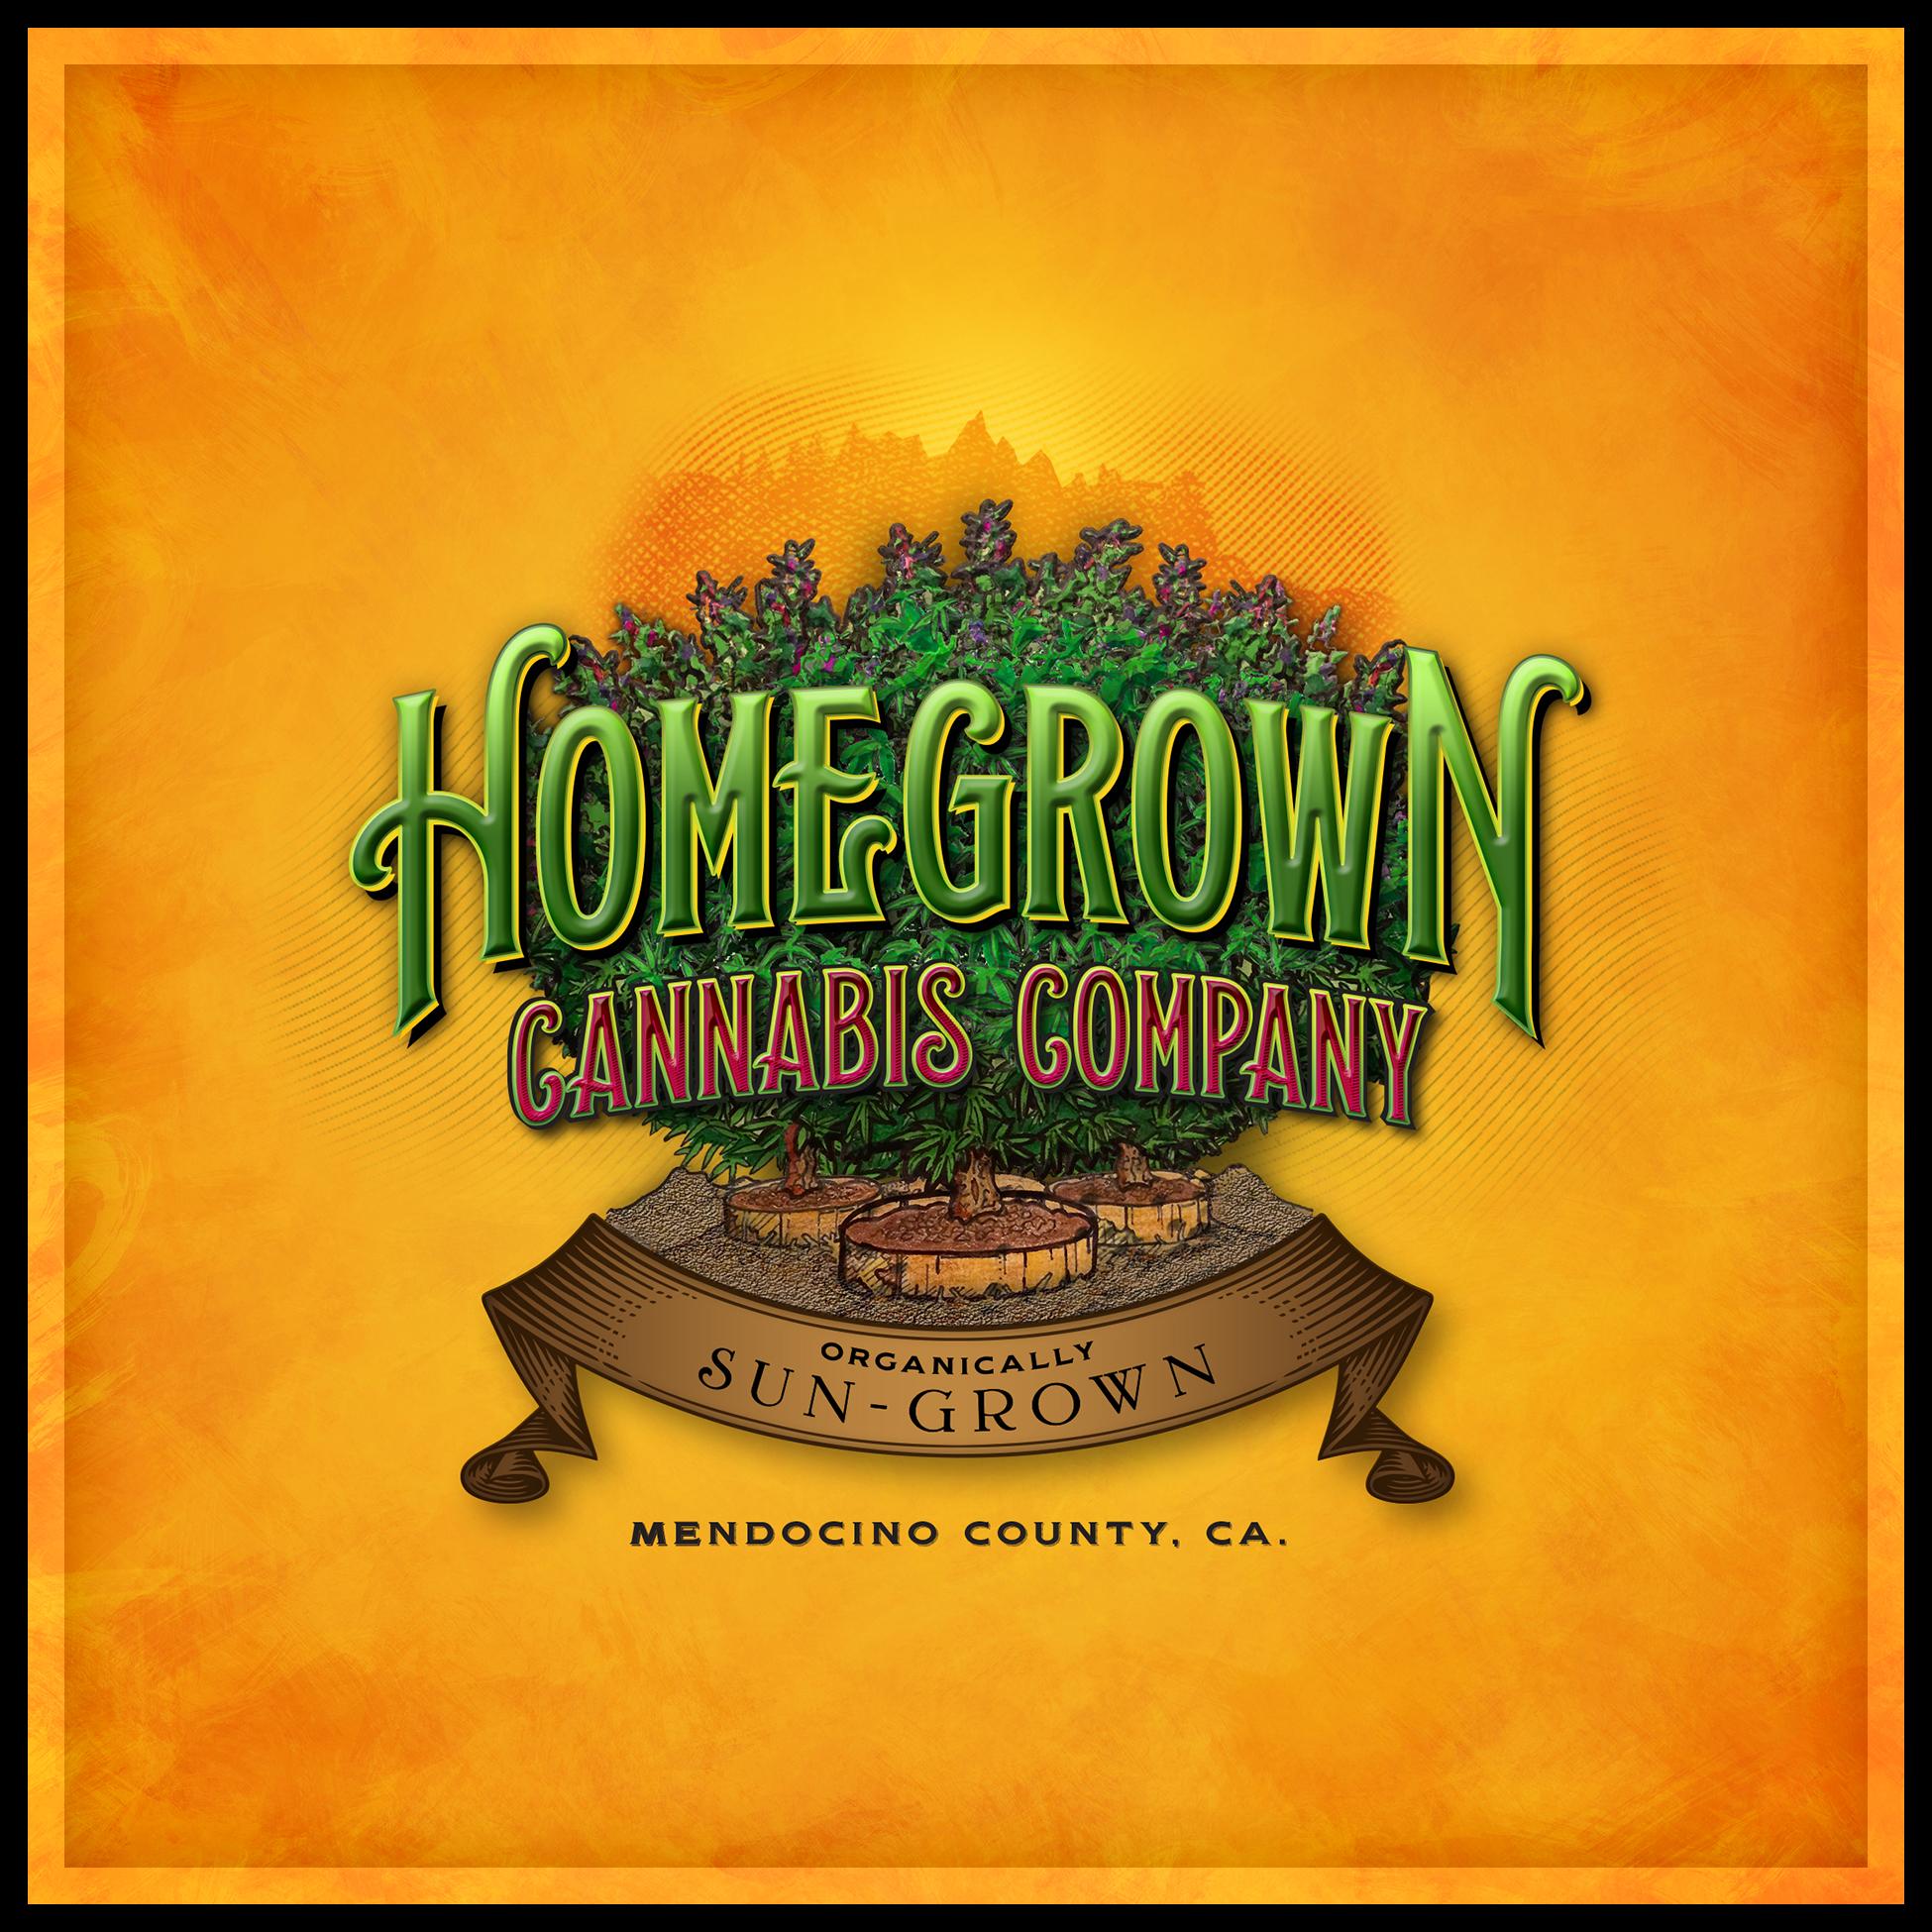 Homegrown Cannabis Company Logo